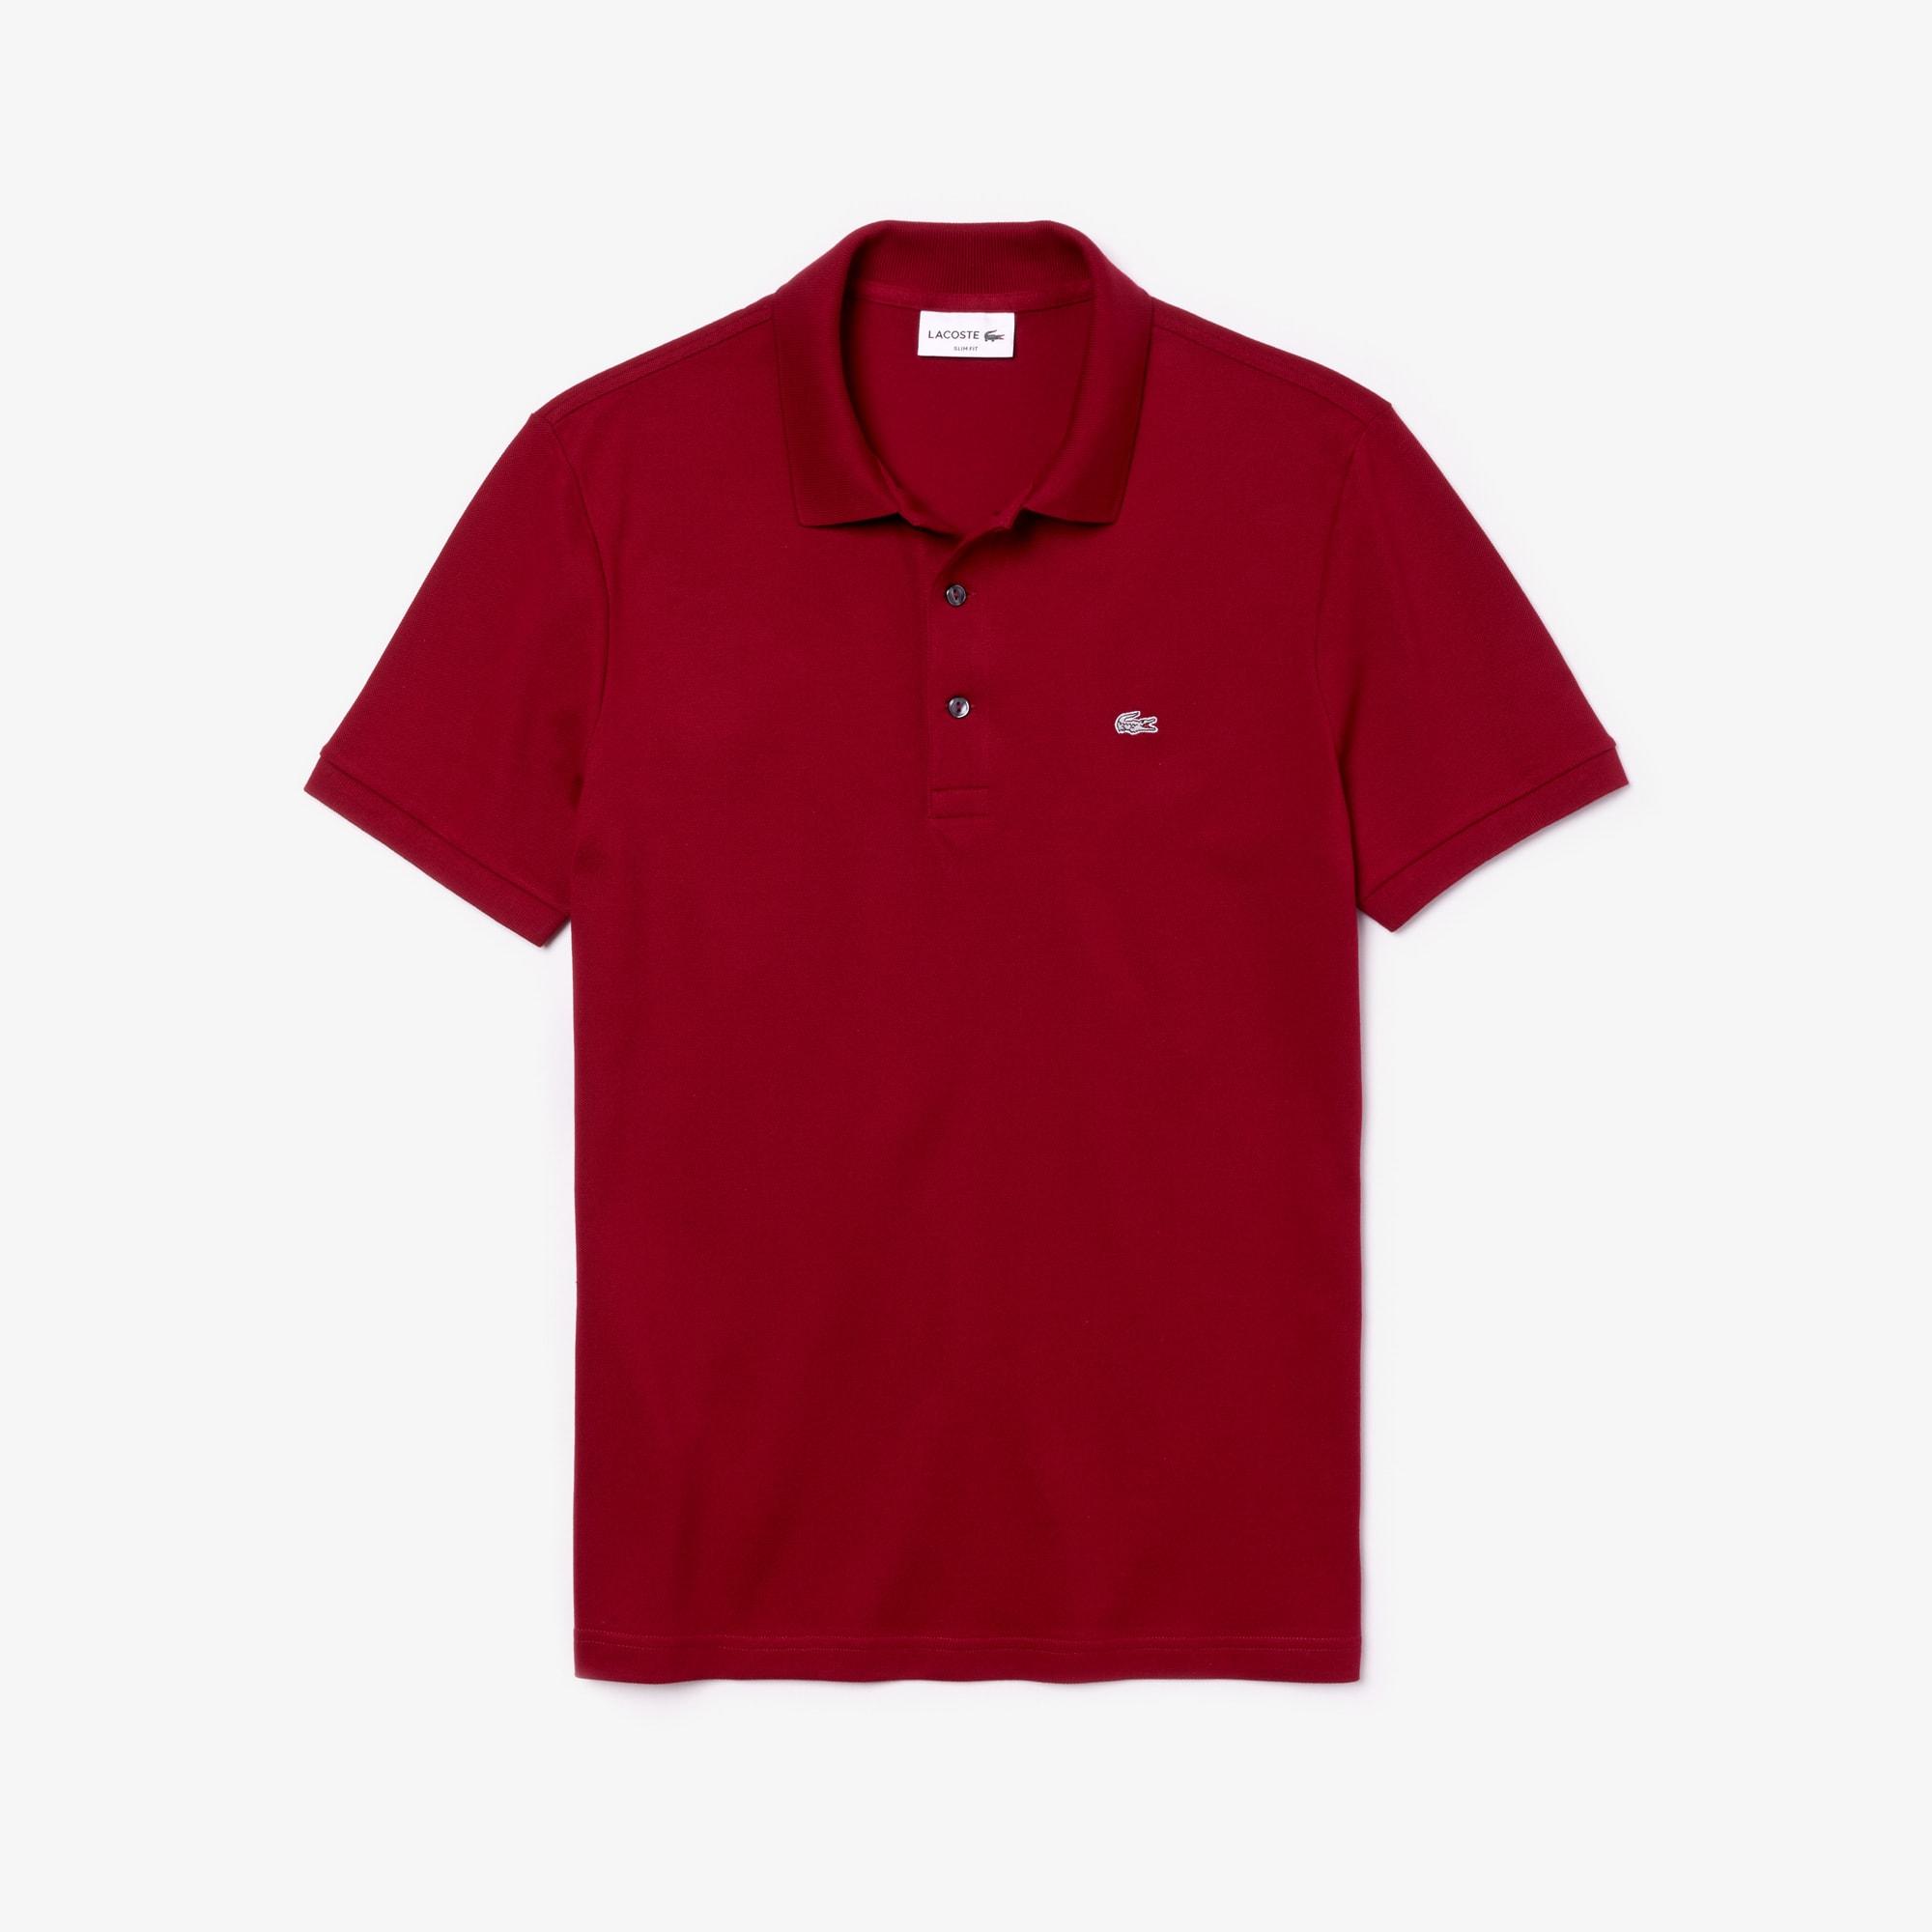 Men's Slim Fit Stretch Piqué Polo Shirt